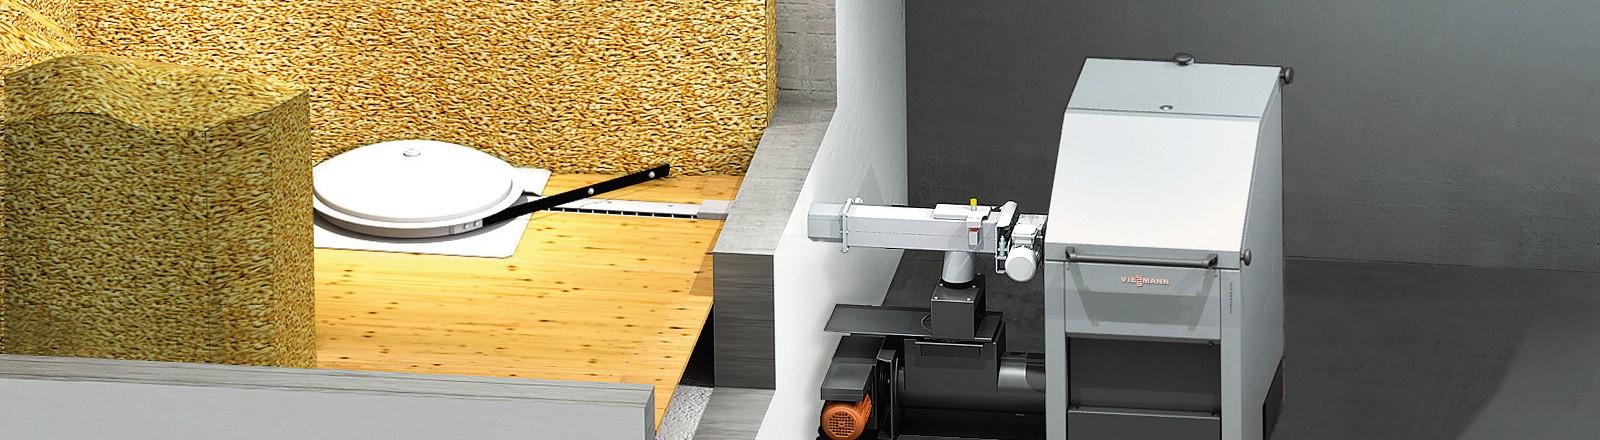 Generatori a Biomassa